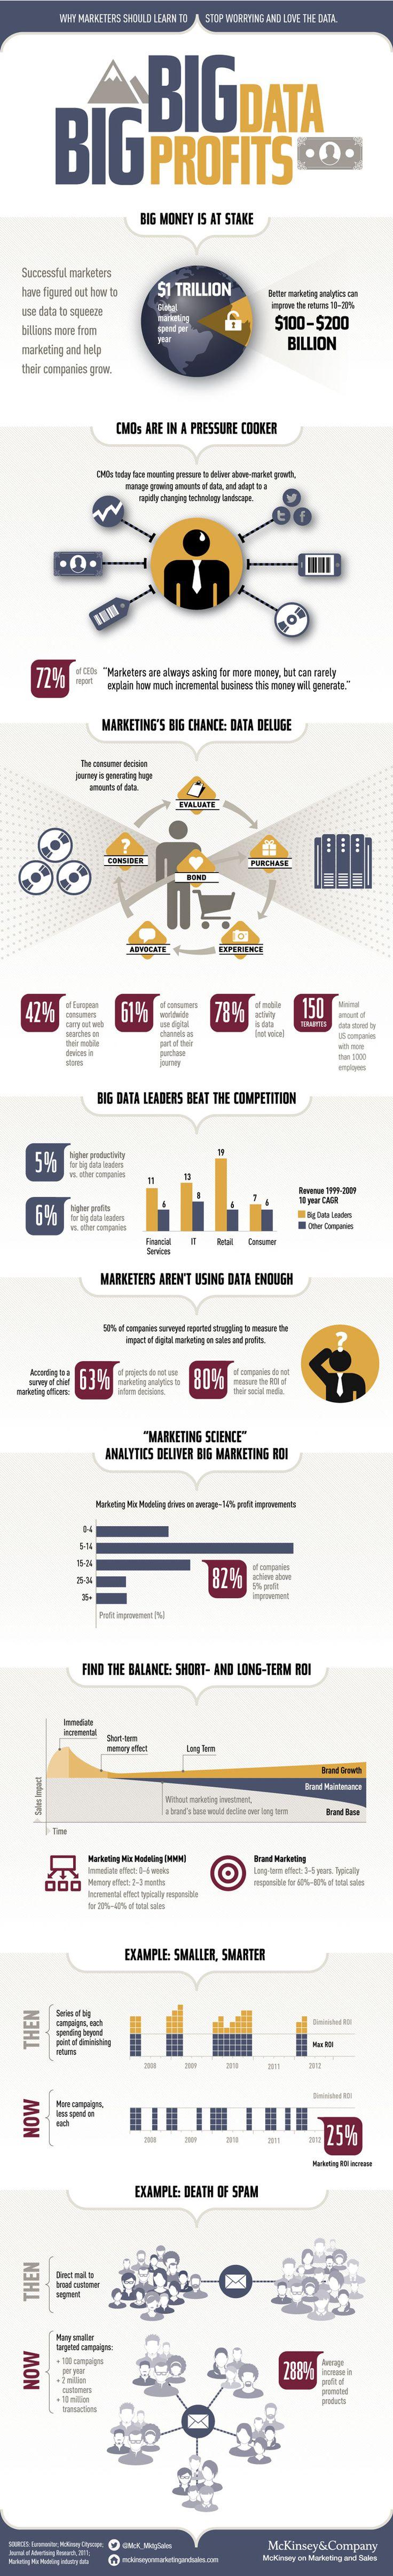 big data big profits infographic